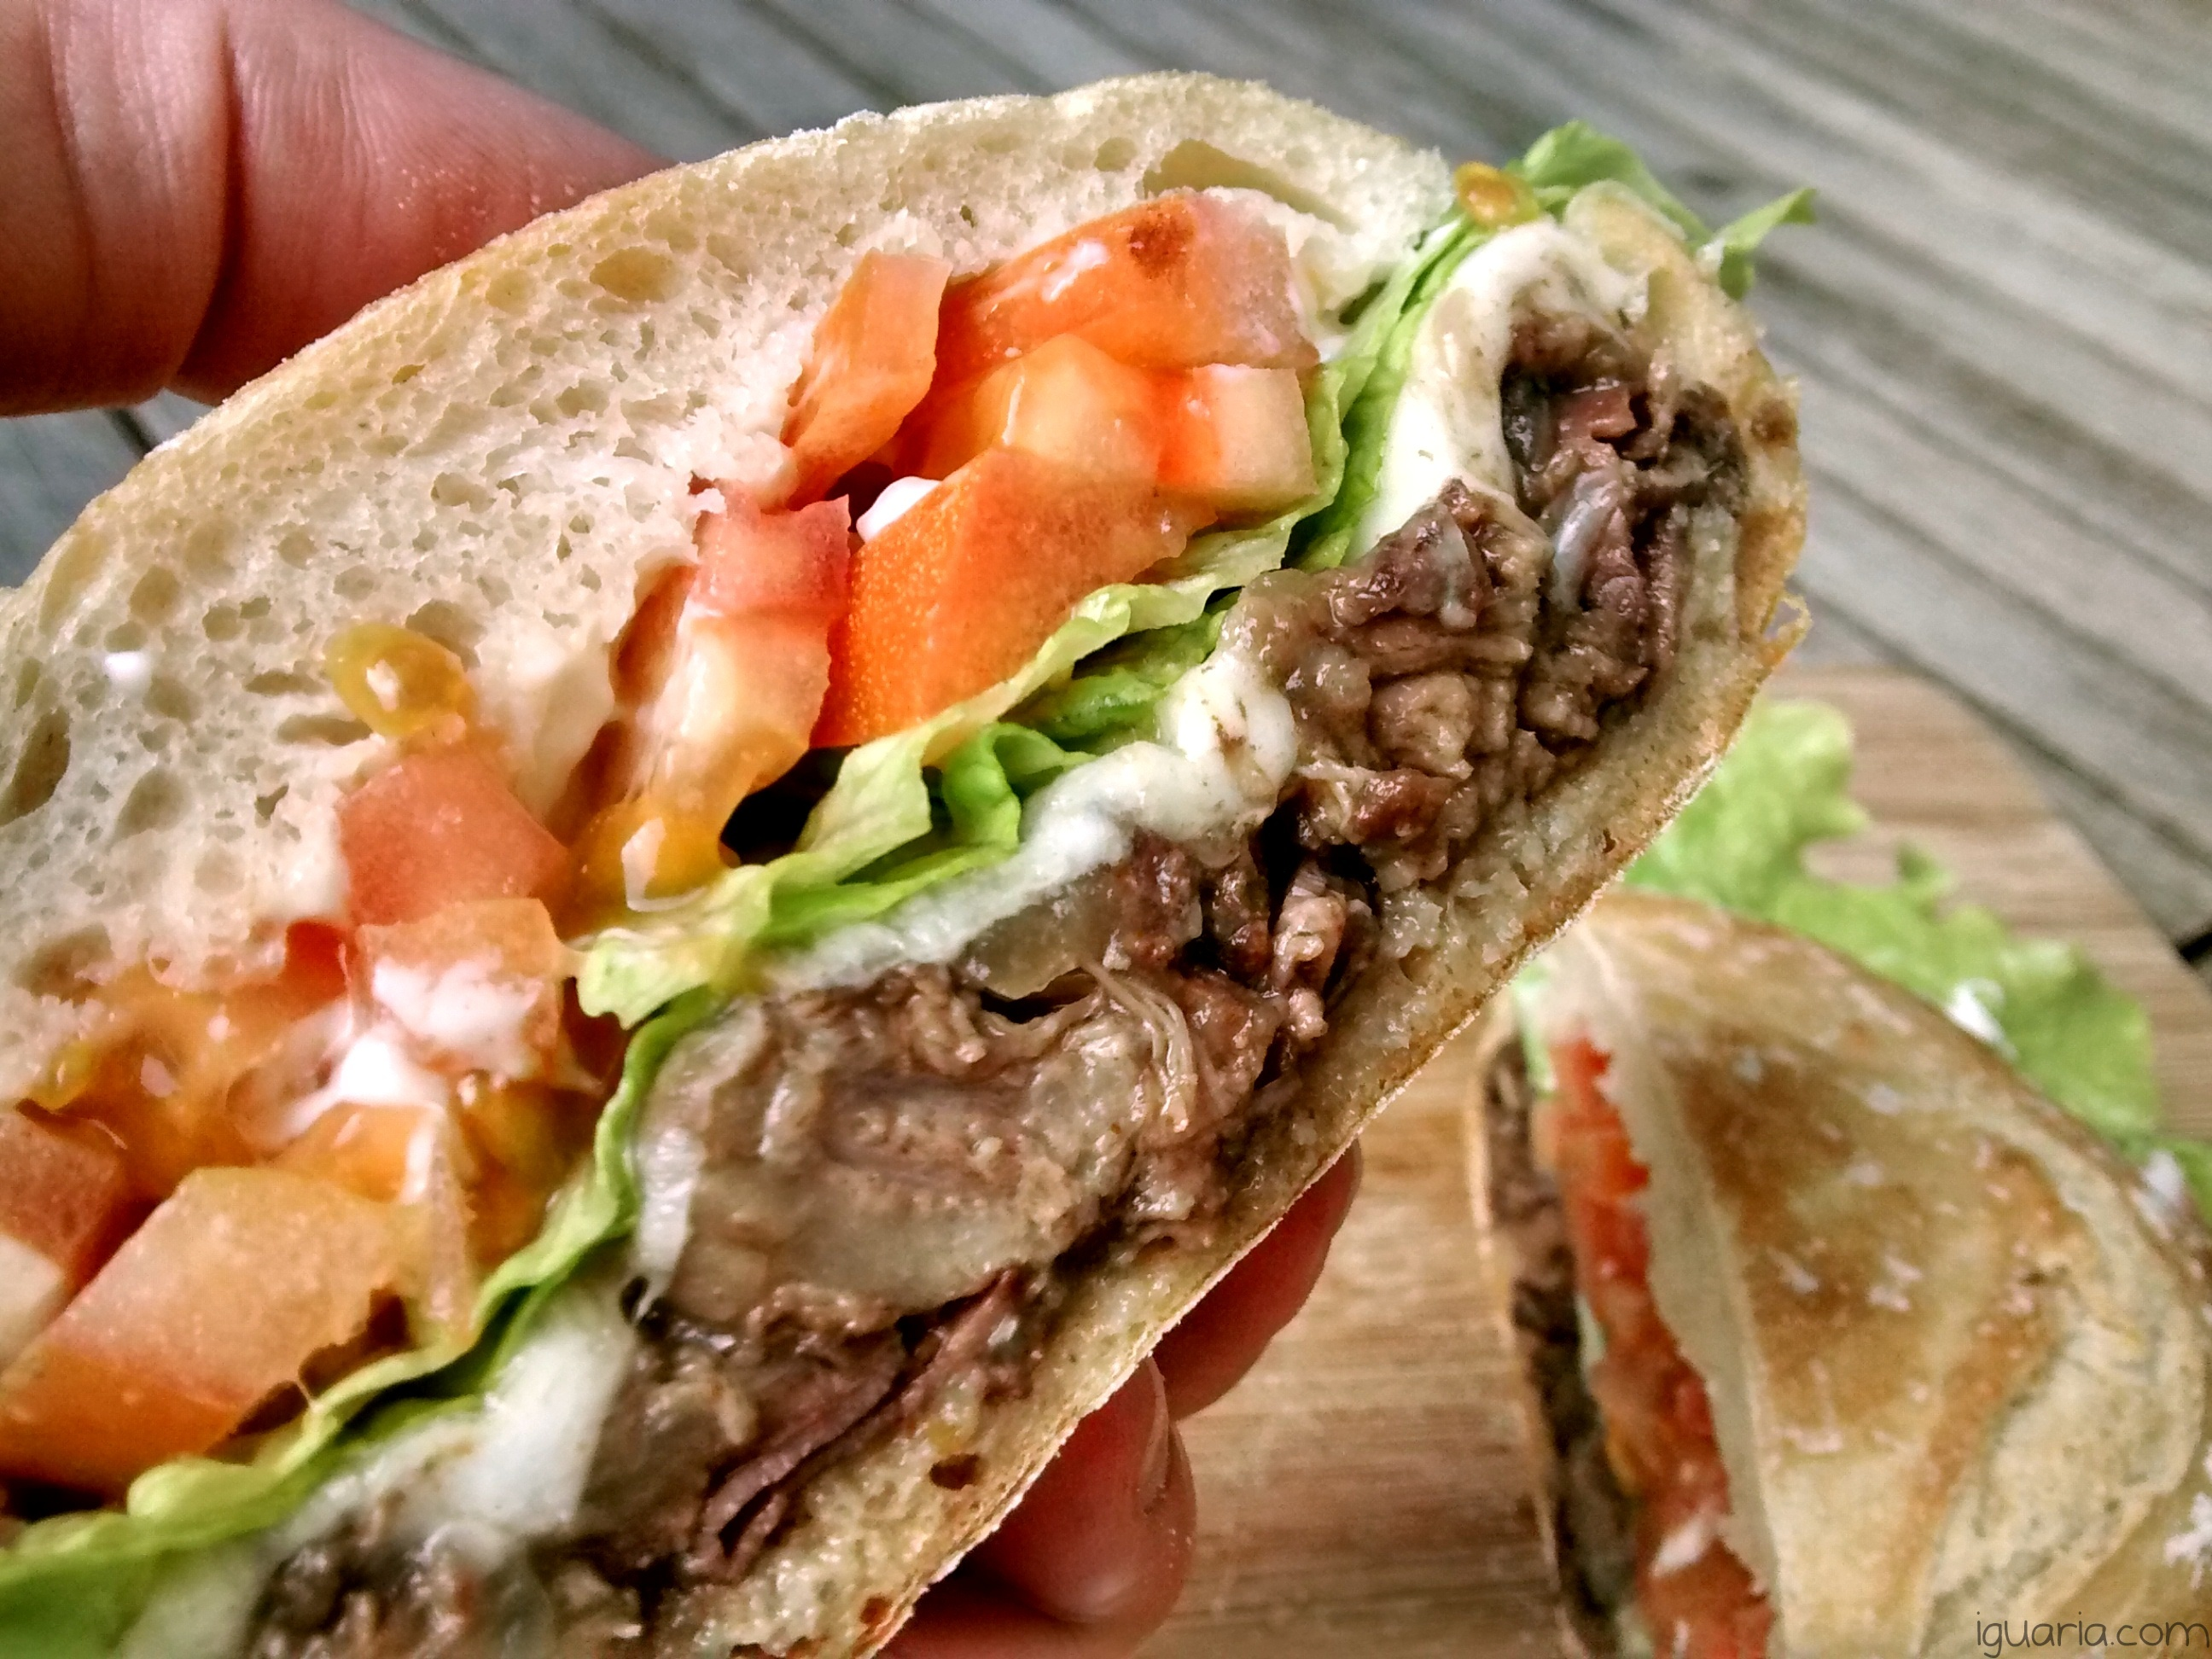 iguaria-deliciosa-sandes-de-carne-assada